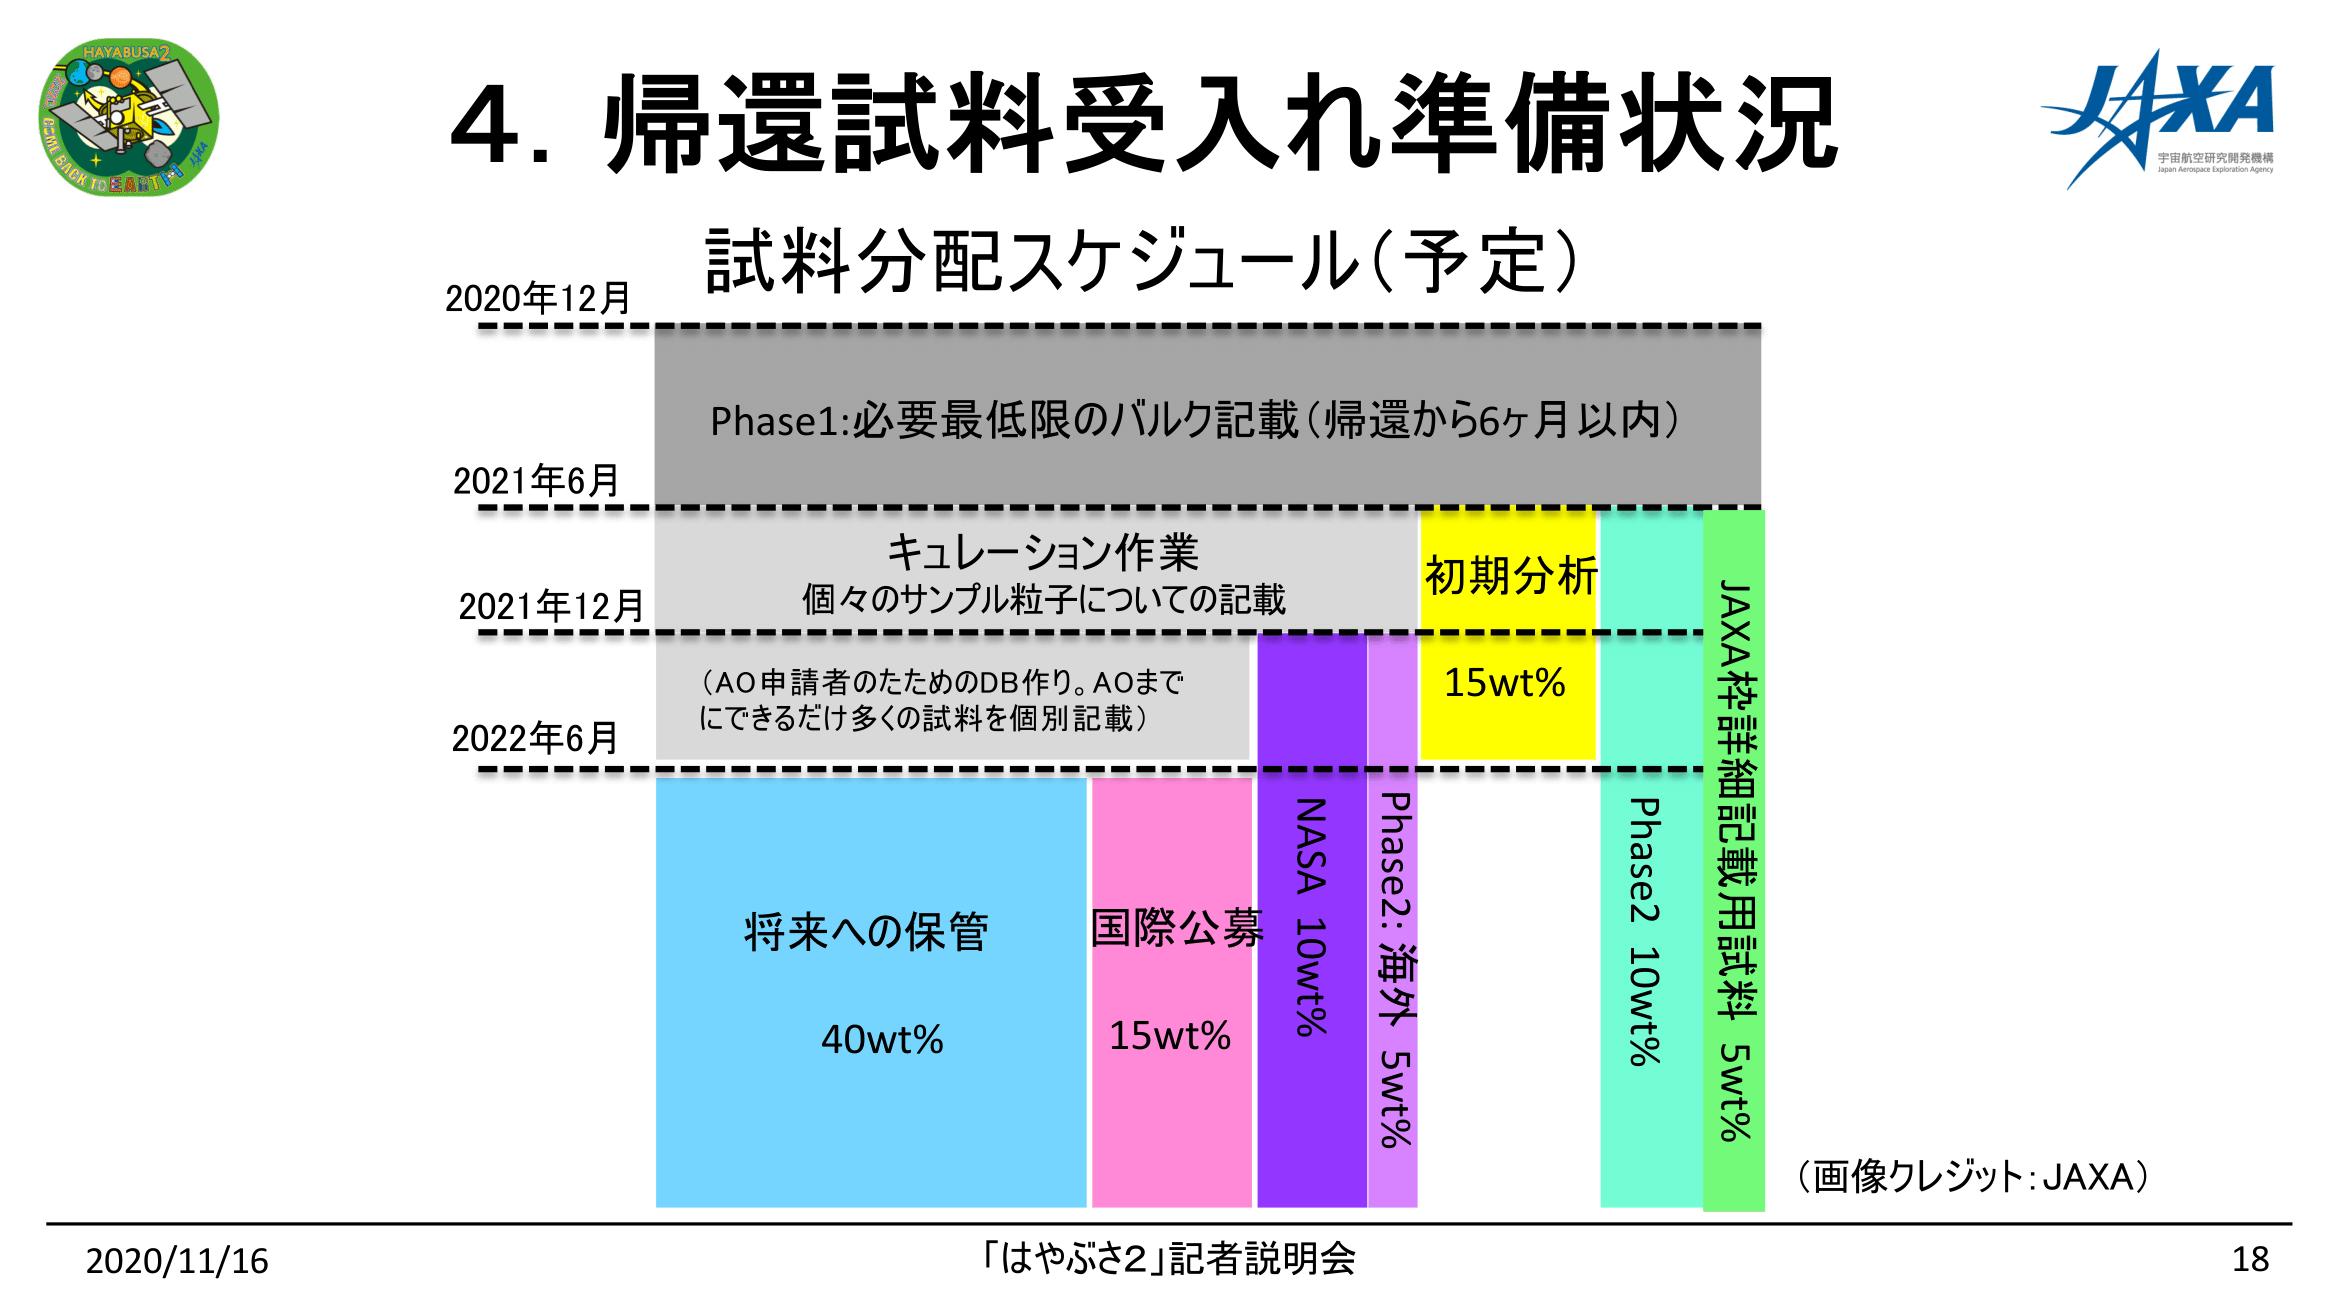 f:id:Imamura:20201116151322p:plain